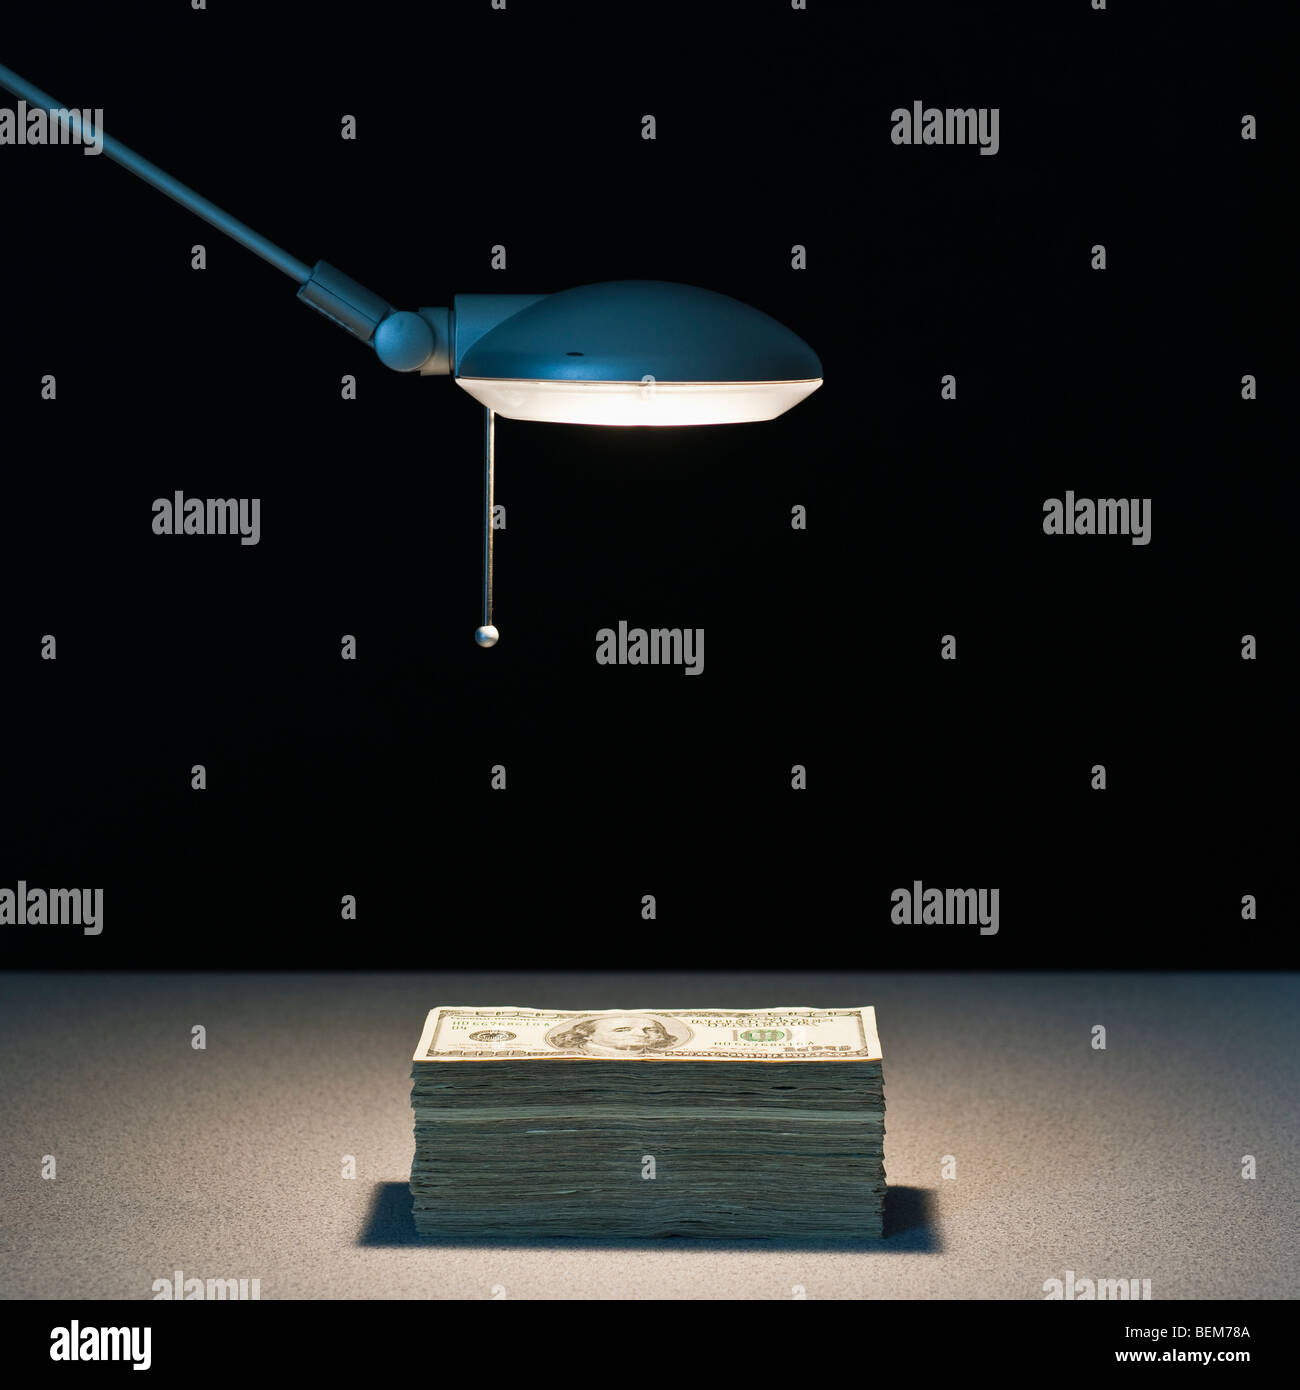 Light on money - Stock Image